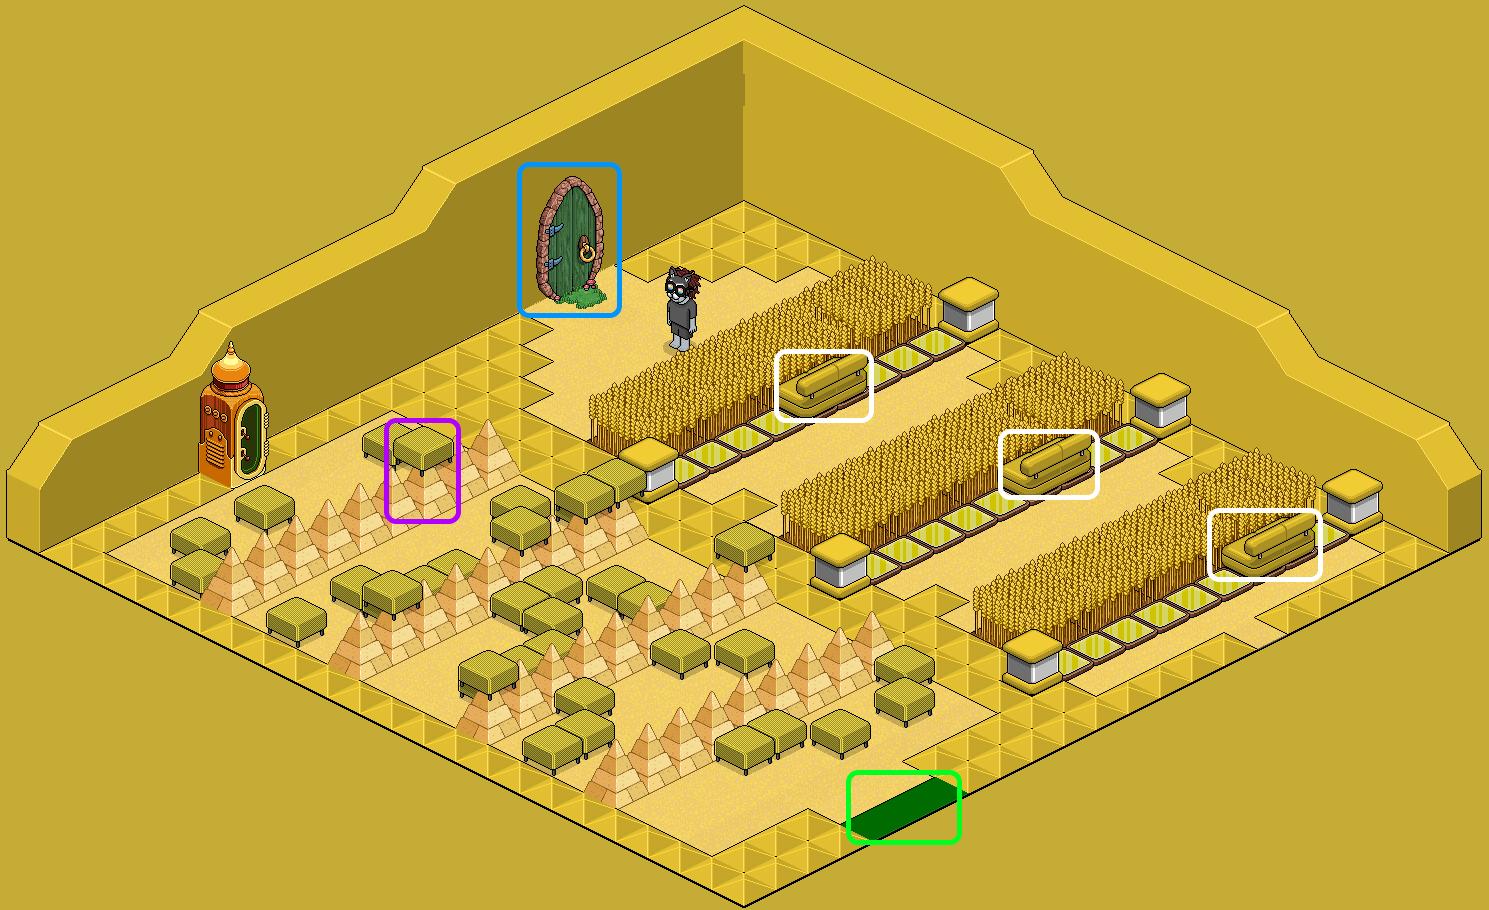 [Pride] Labyrinthe - Jaune